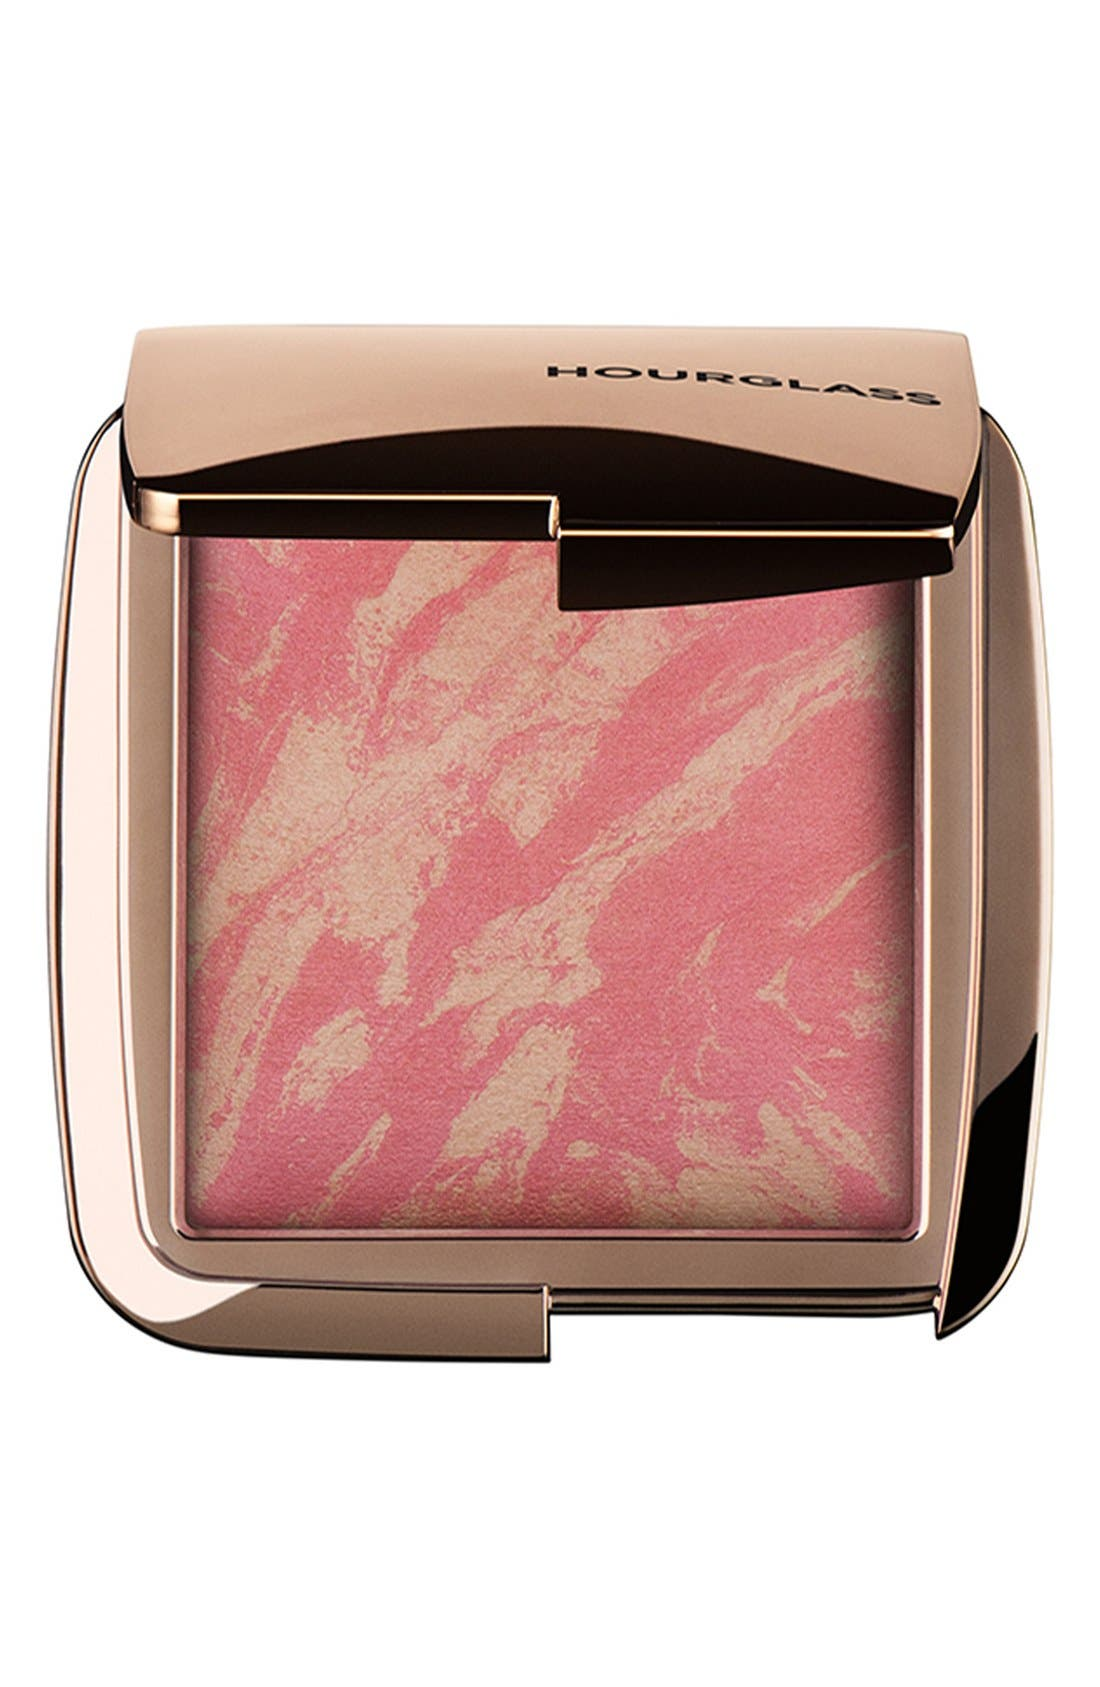 Ambient<sup>®</sup> Lighting Blush,                         Main,                         color, LUMINOUS FLUSH